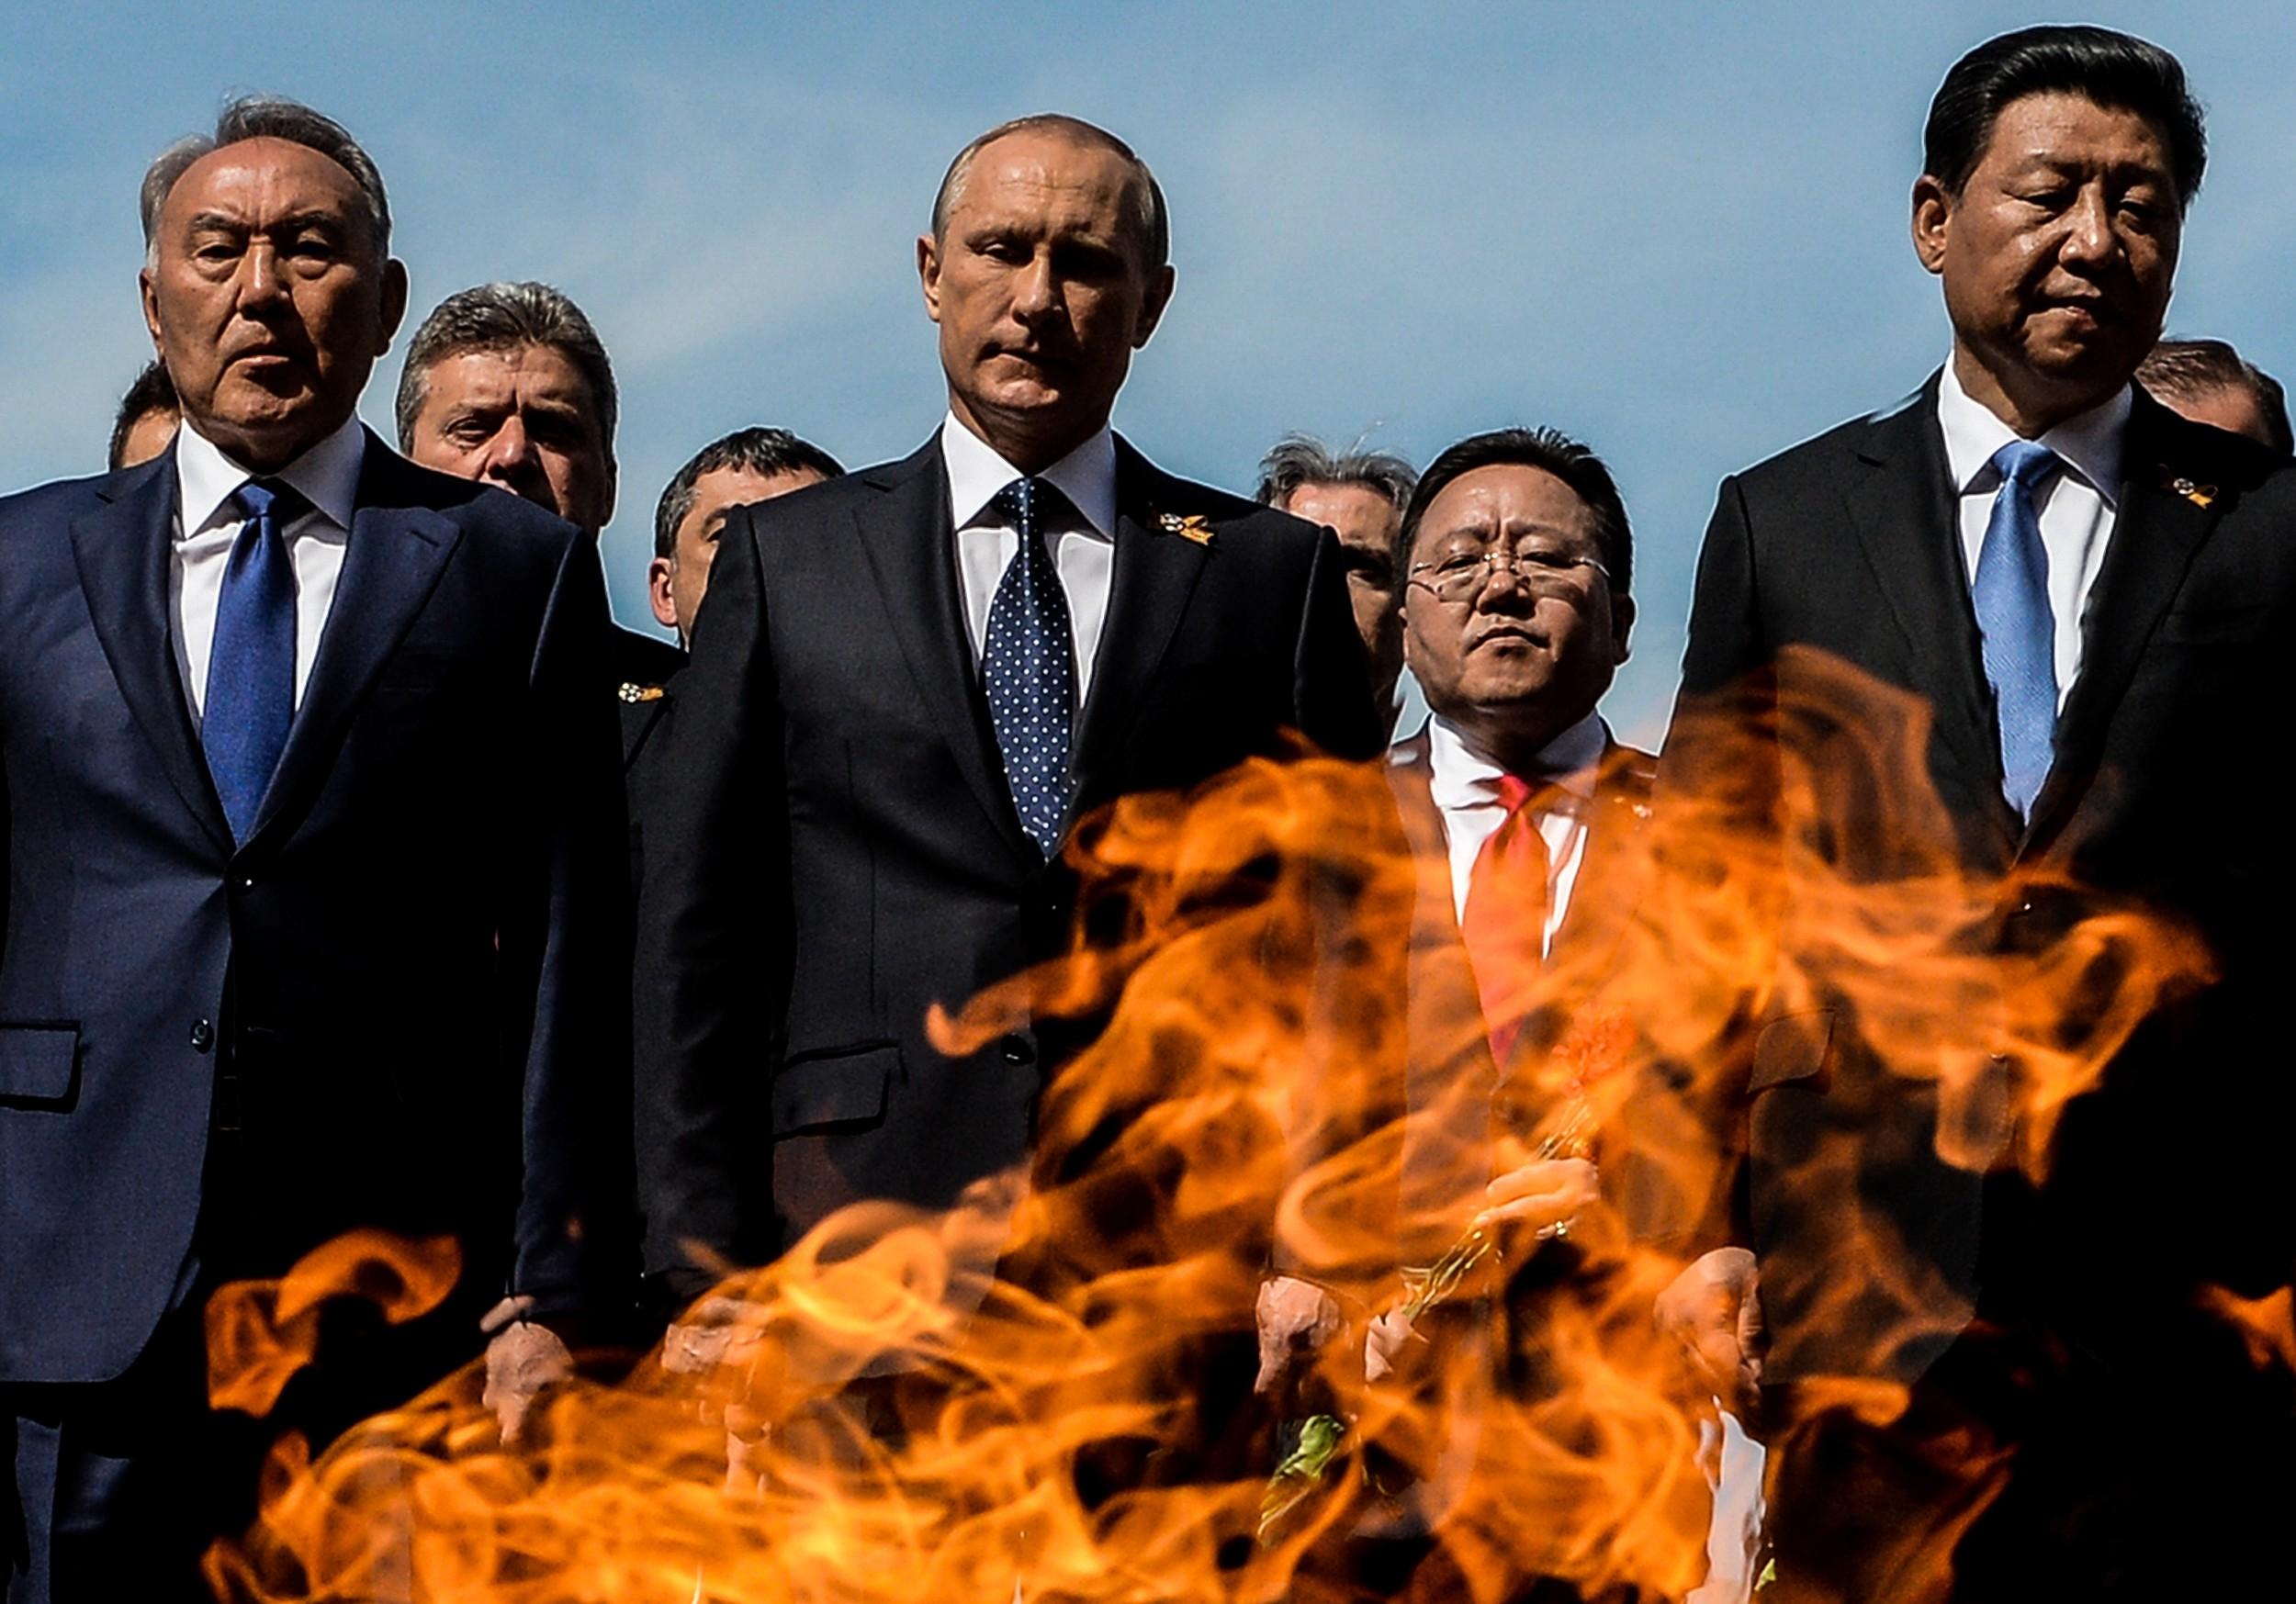 <p><span>Нурсултан Назарбаев,&nbsp;Владимир Путин,&nbsp;Си Цзиньпин (слева направо).&nbsp;</span>Фото: &copy; РИА Новости/Алексей Филиппов</p>